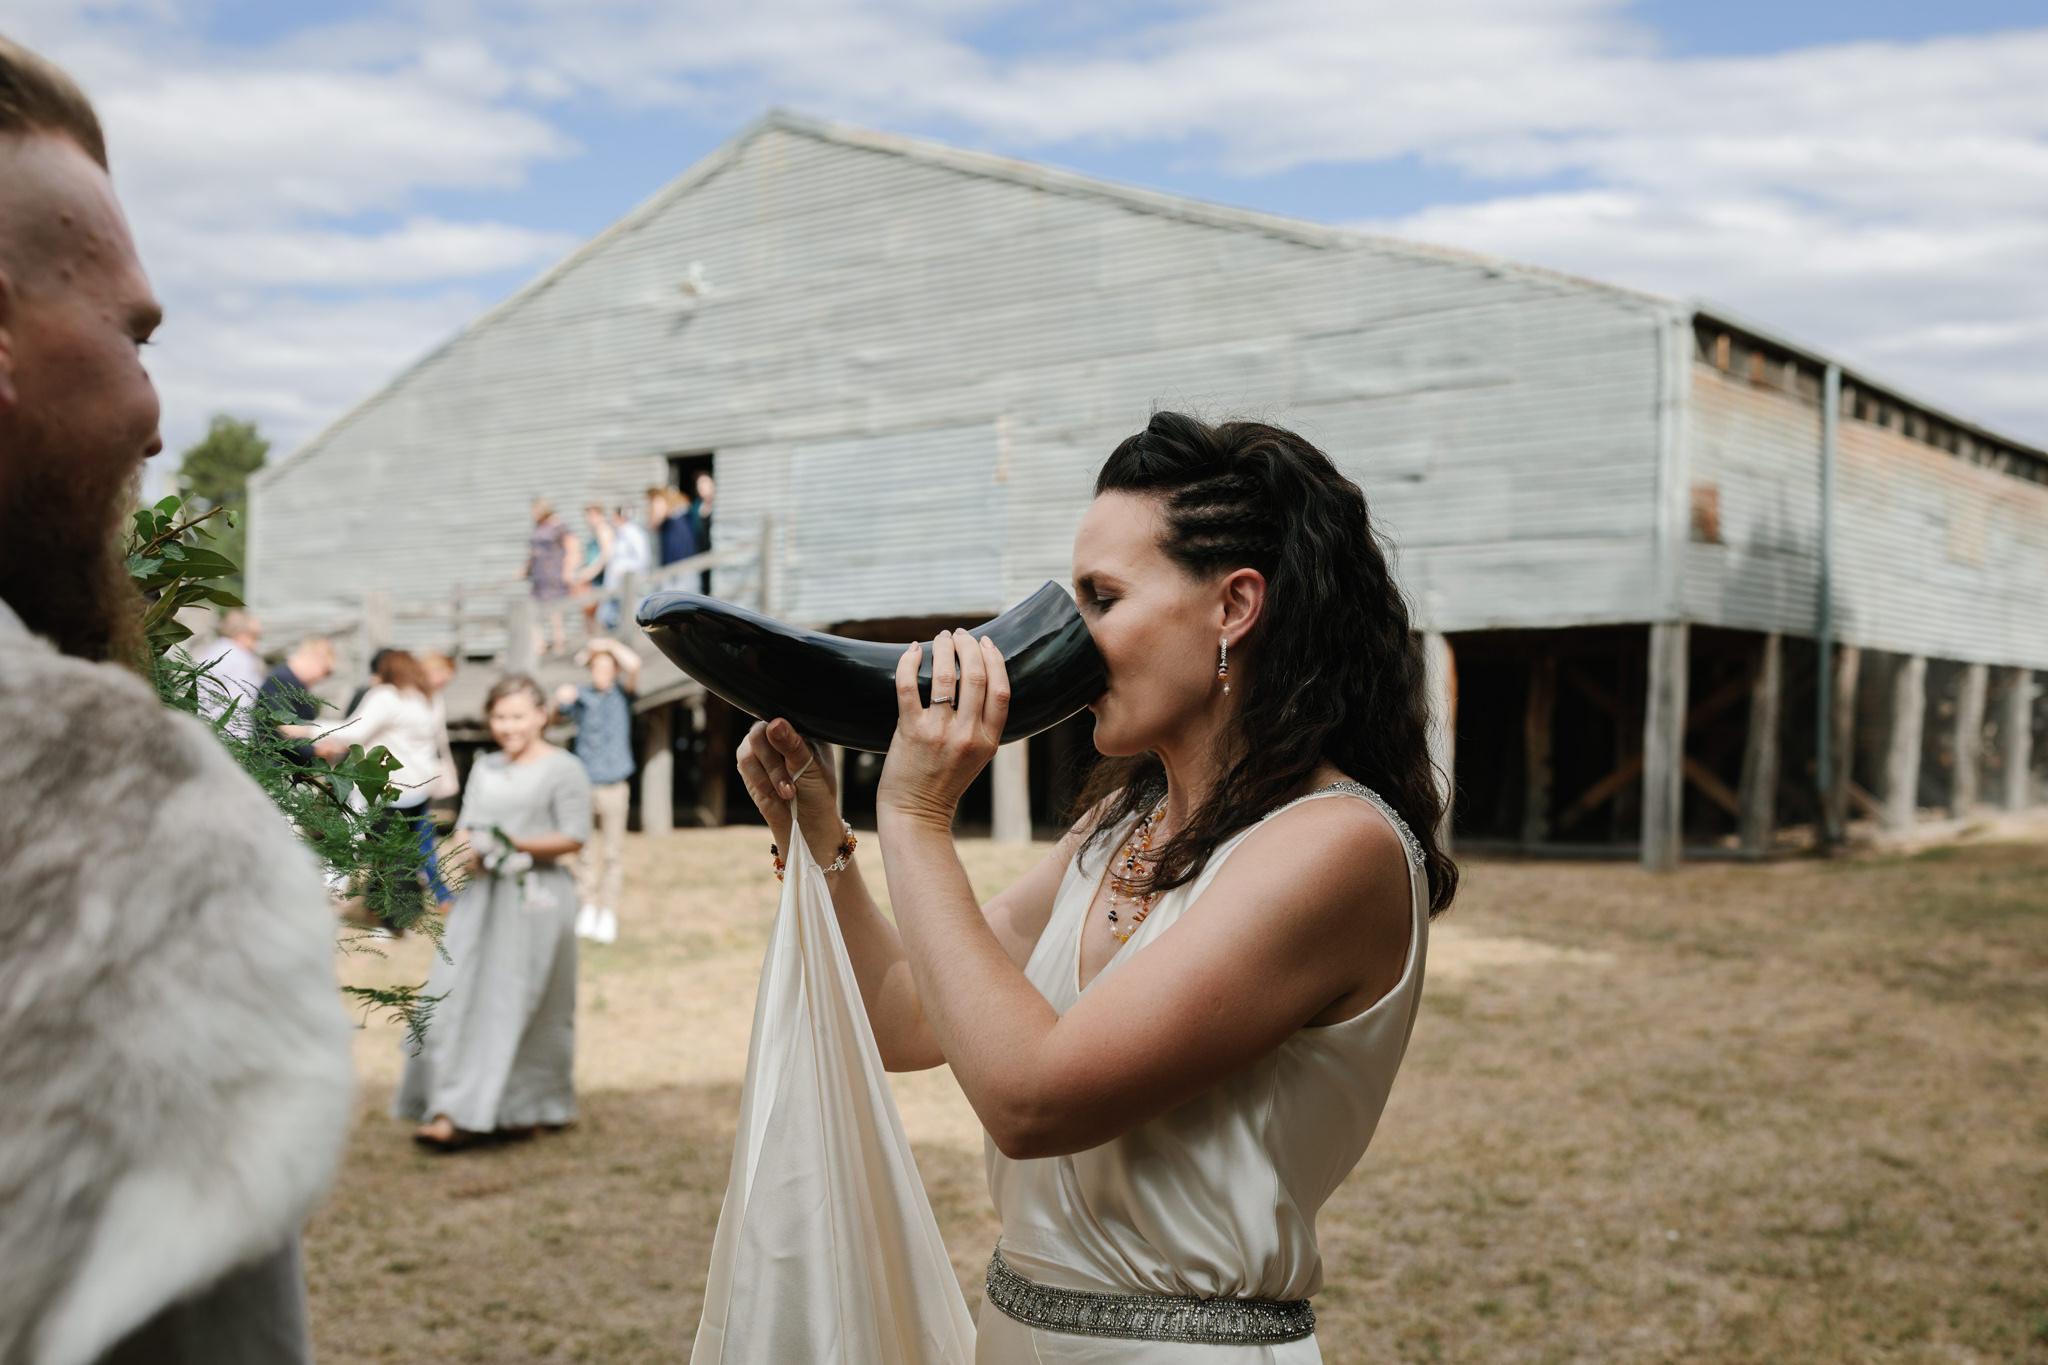 Yarralumla Woolshed Canberra Wedding Photographer Erin Latimore_144.JPG